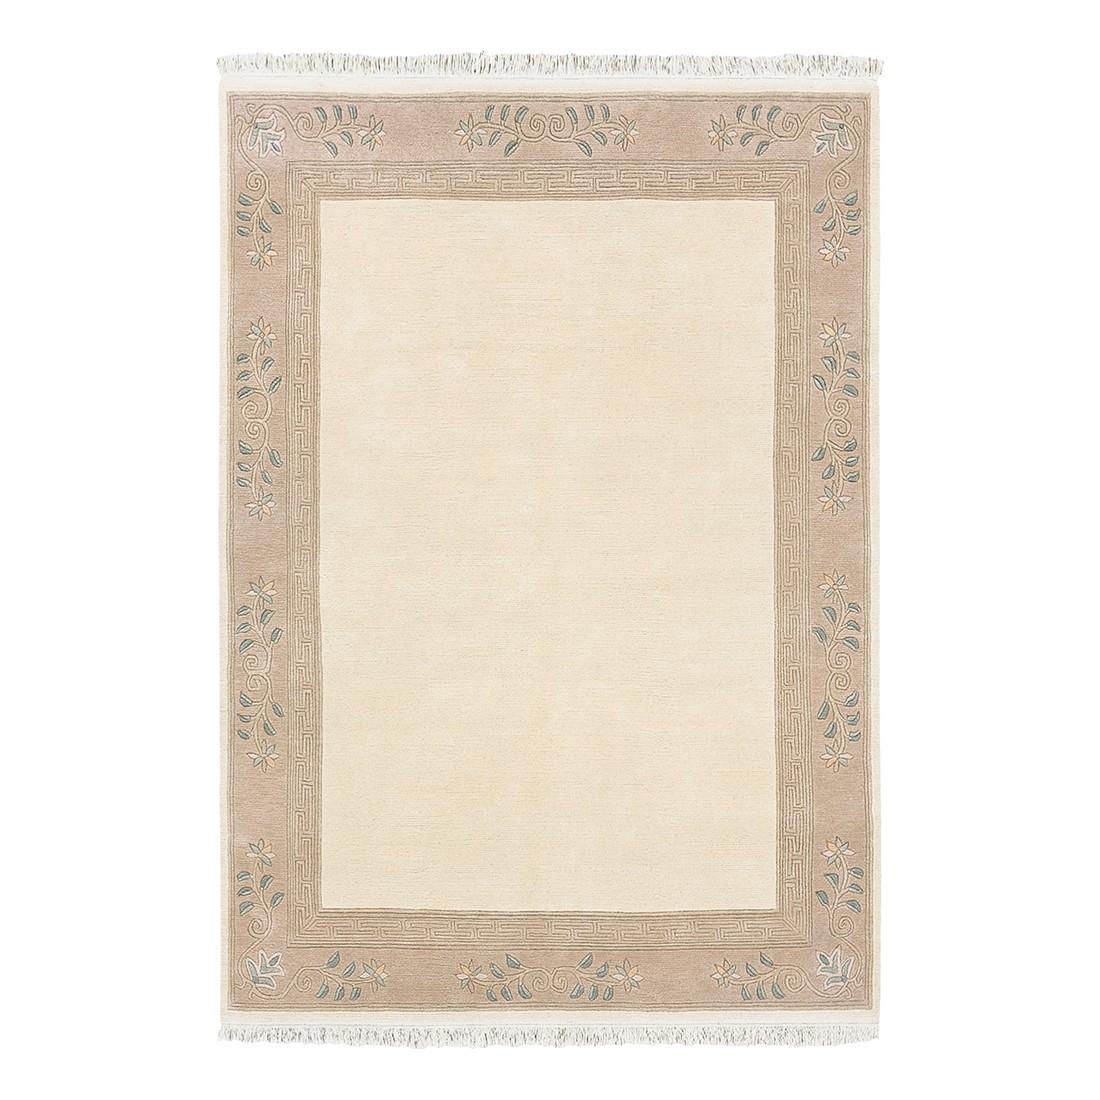 Teppich Floral - Creme - 170 x 240 cm, Luxor living